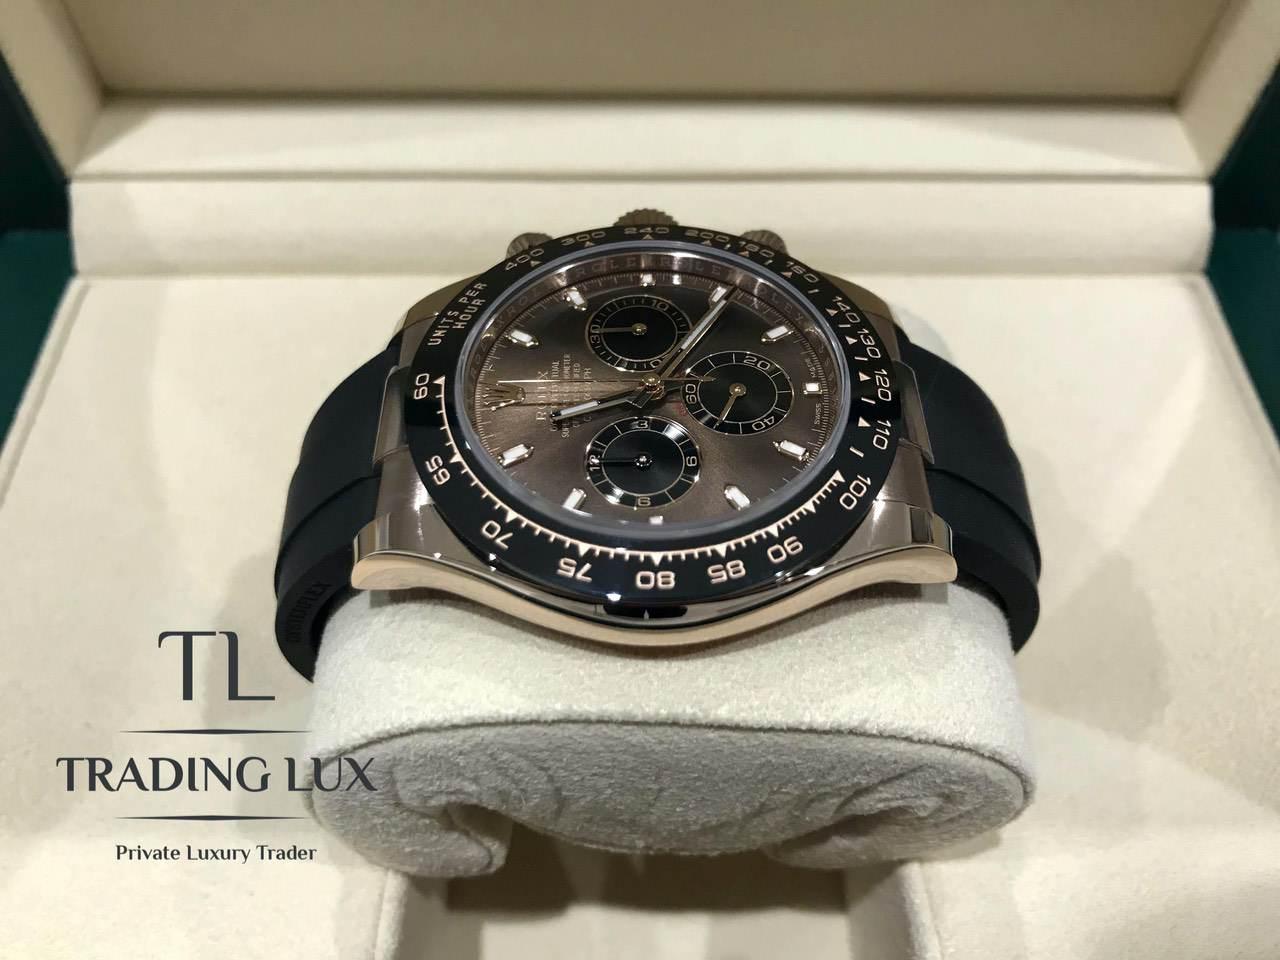 Rolex-Daytona-116515LN-Chocolate-9